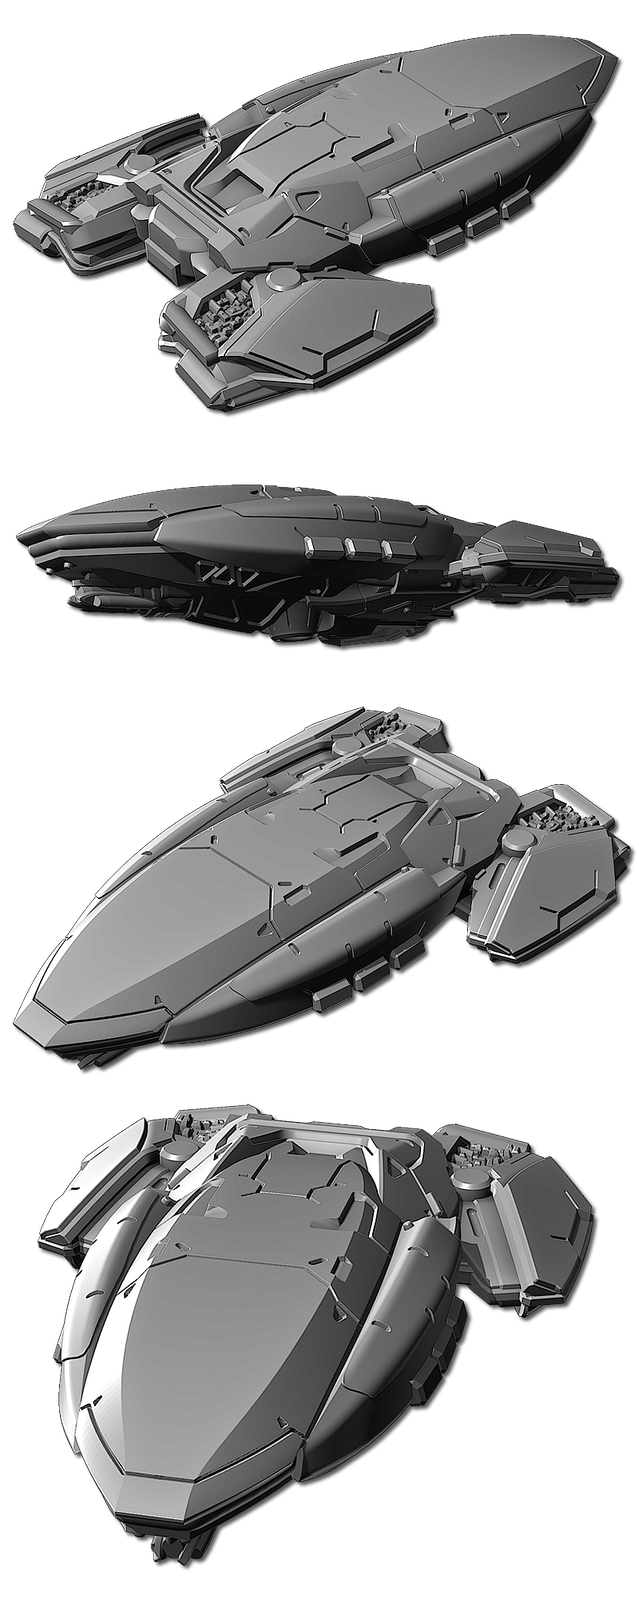 KS Firestorm Armada 2017 - GO ! 76f56566ad55baaa1941380efebc3b46_original